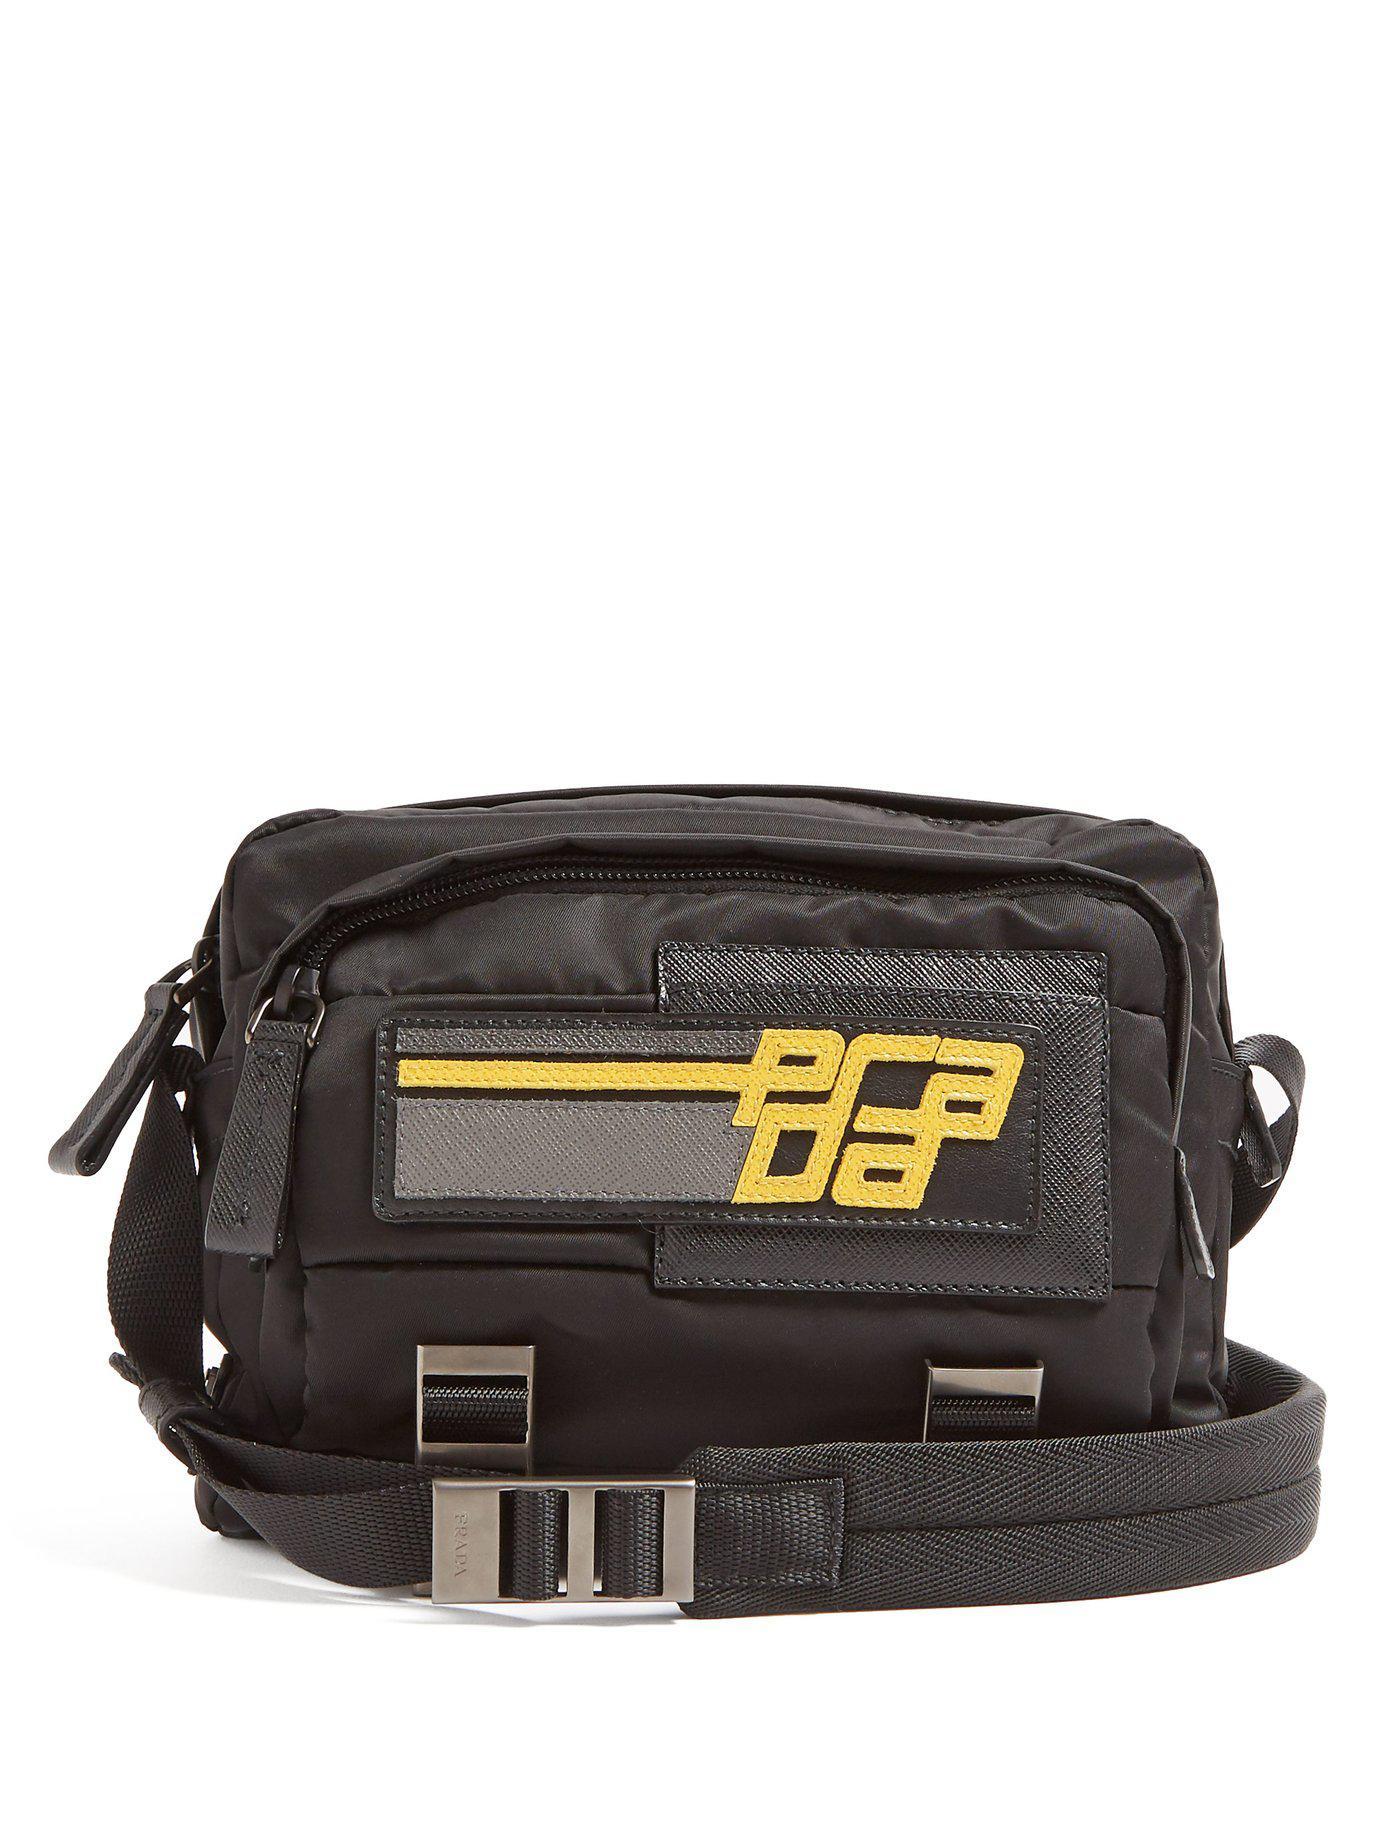 9ec00244a07b Lyst - Prada Logo Patch Nylon Cross Body Bag in Black for Men